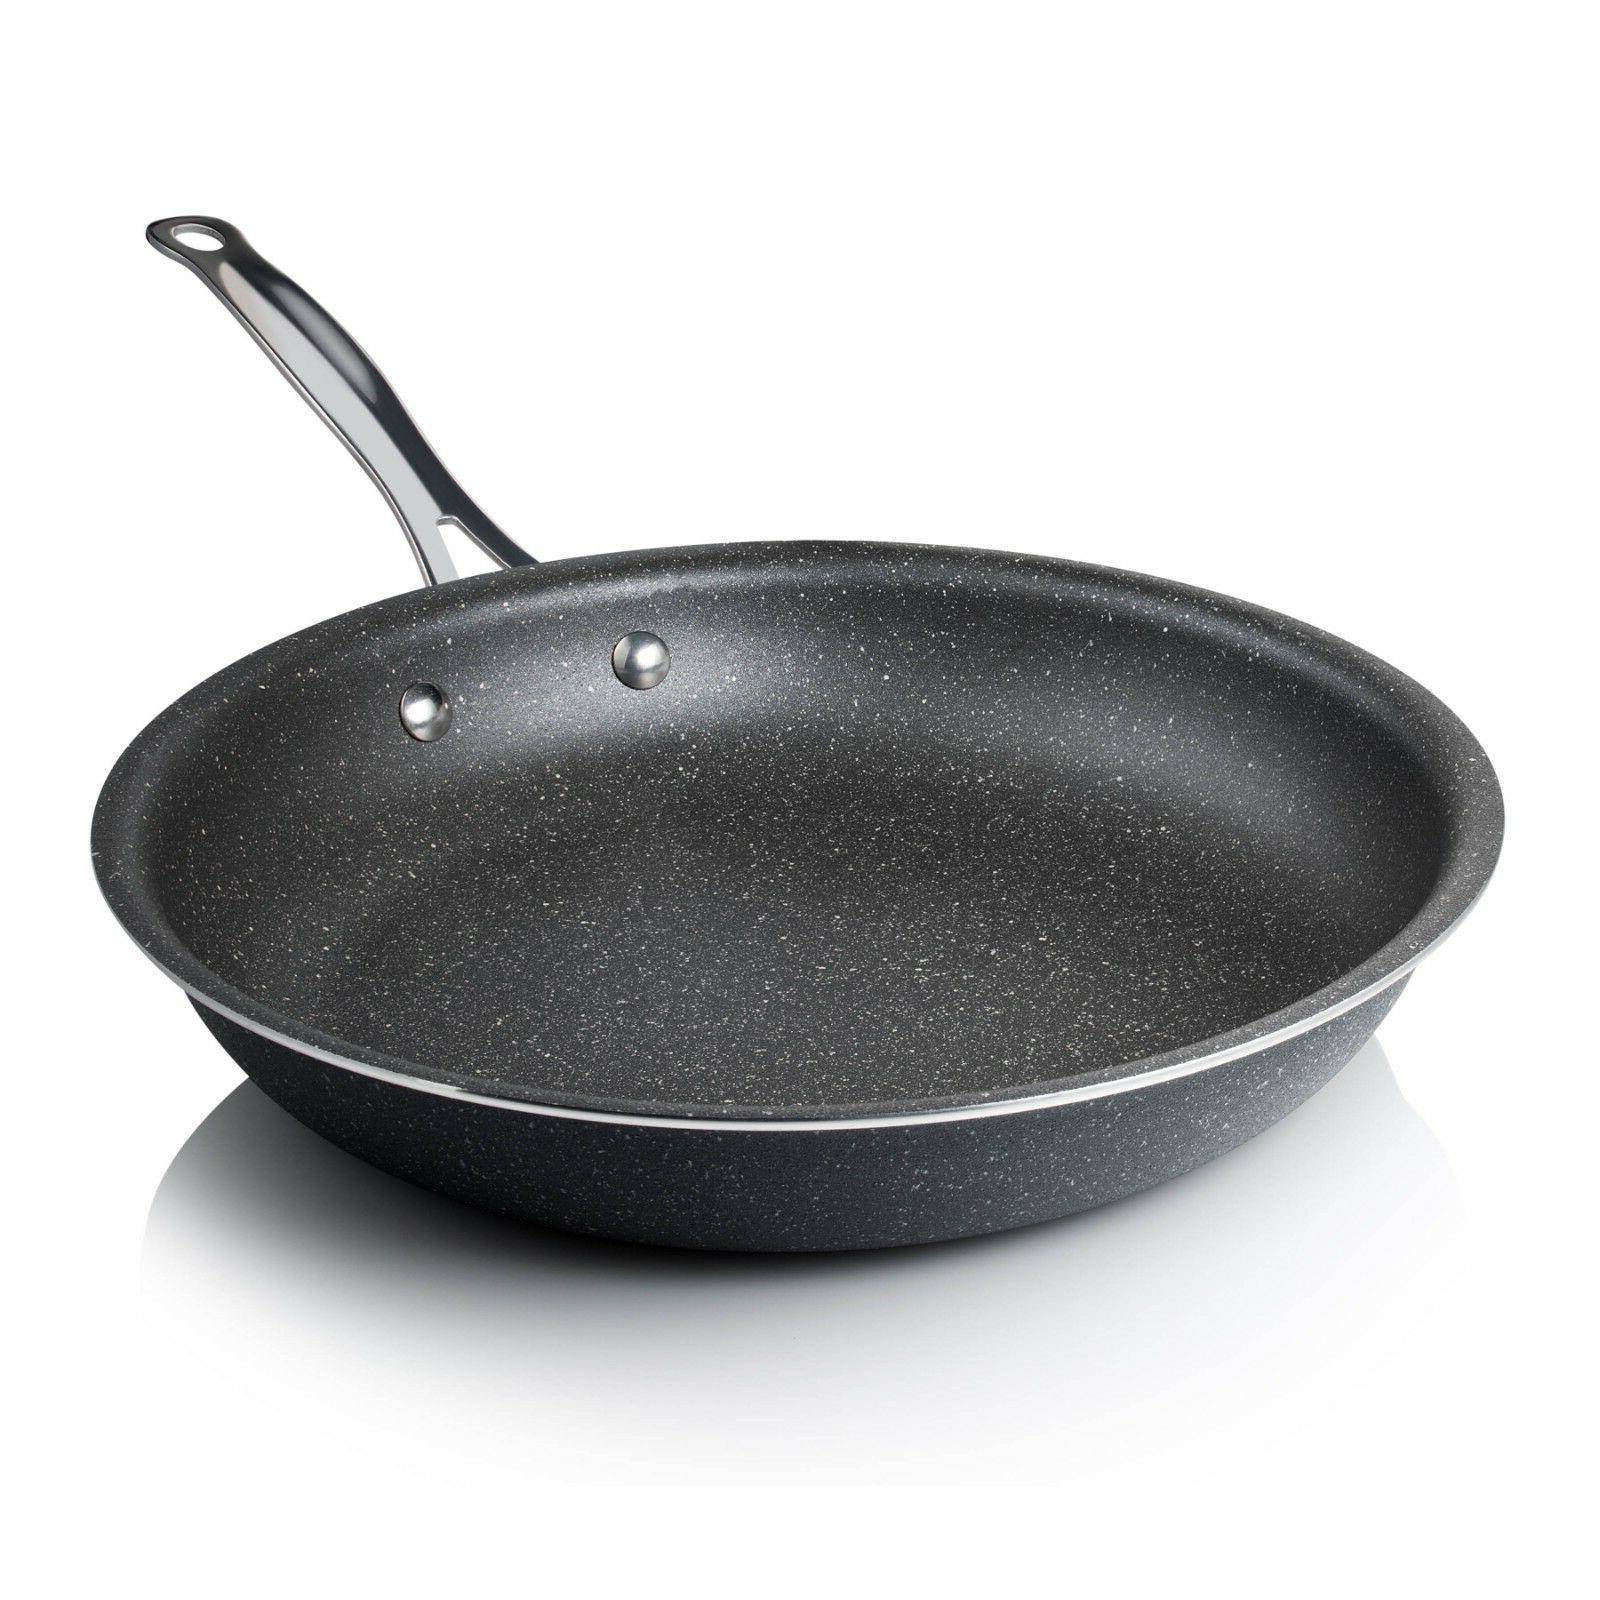 Granite Piece Nonstick Cookware